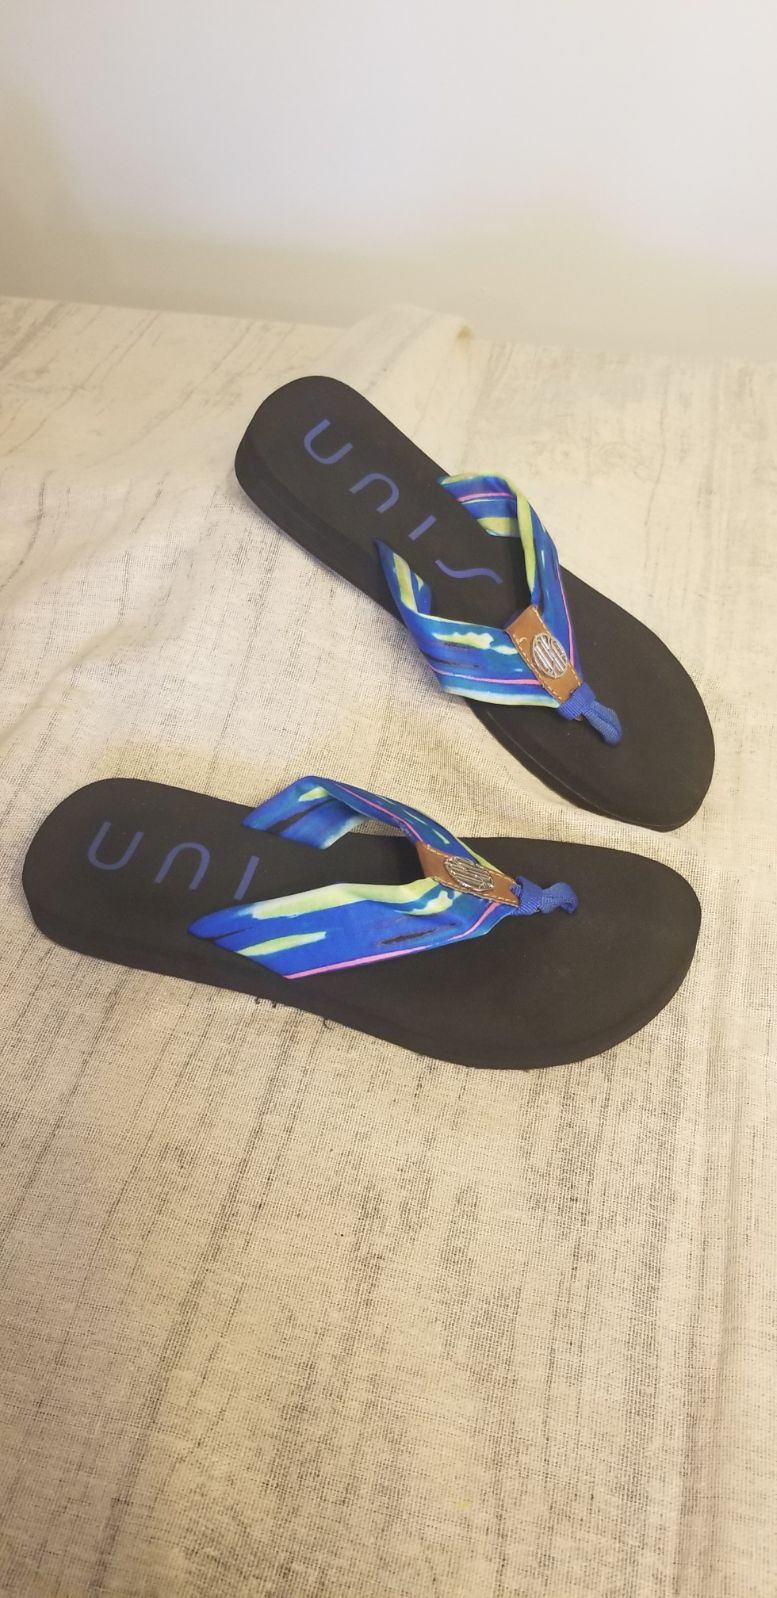 Unisa flip flops size 7 ladies